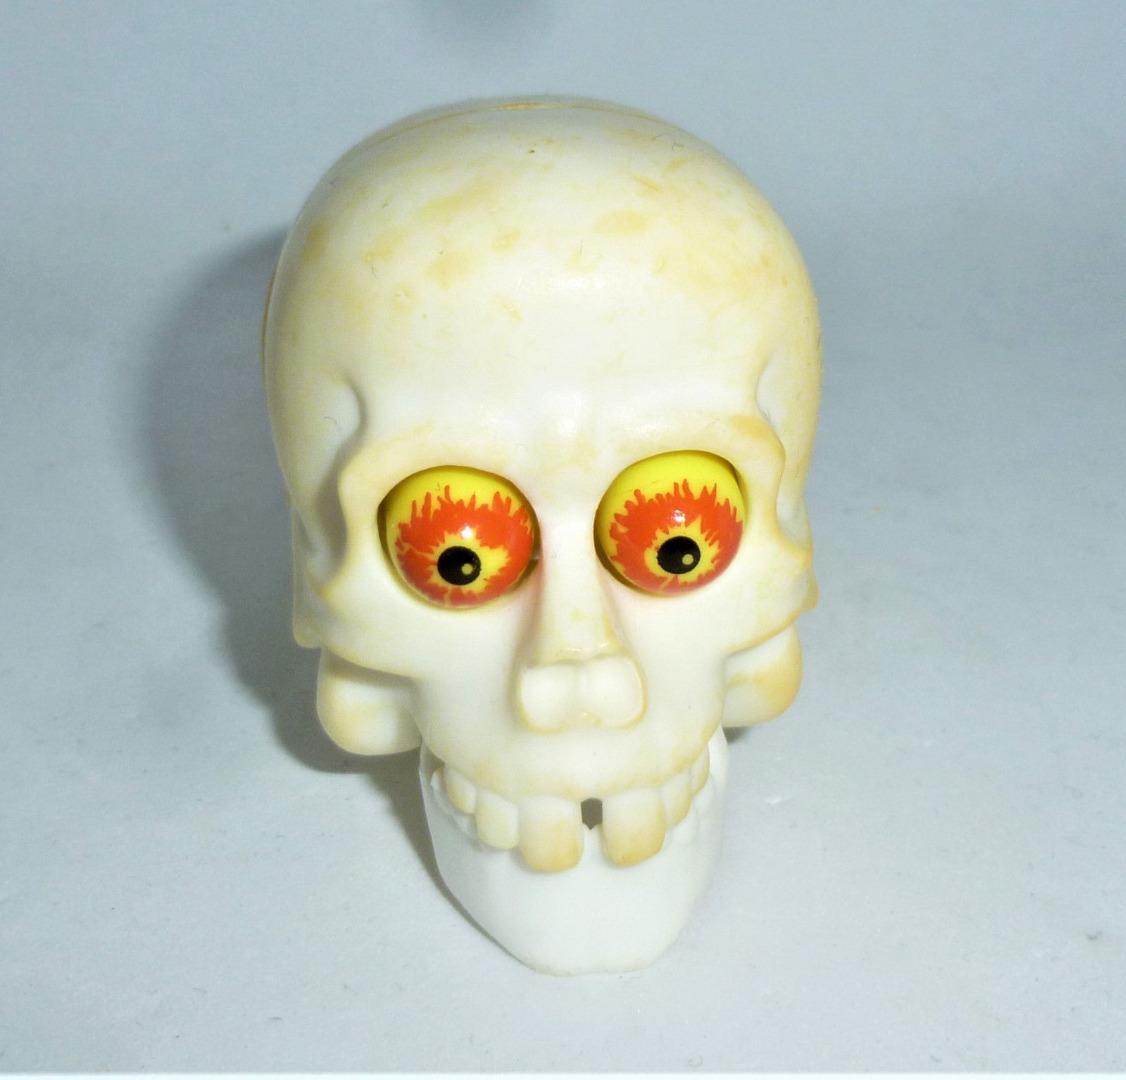 Bad-to-the-Bone Ghost / Knochengeist 3